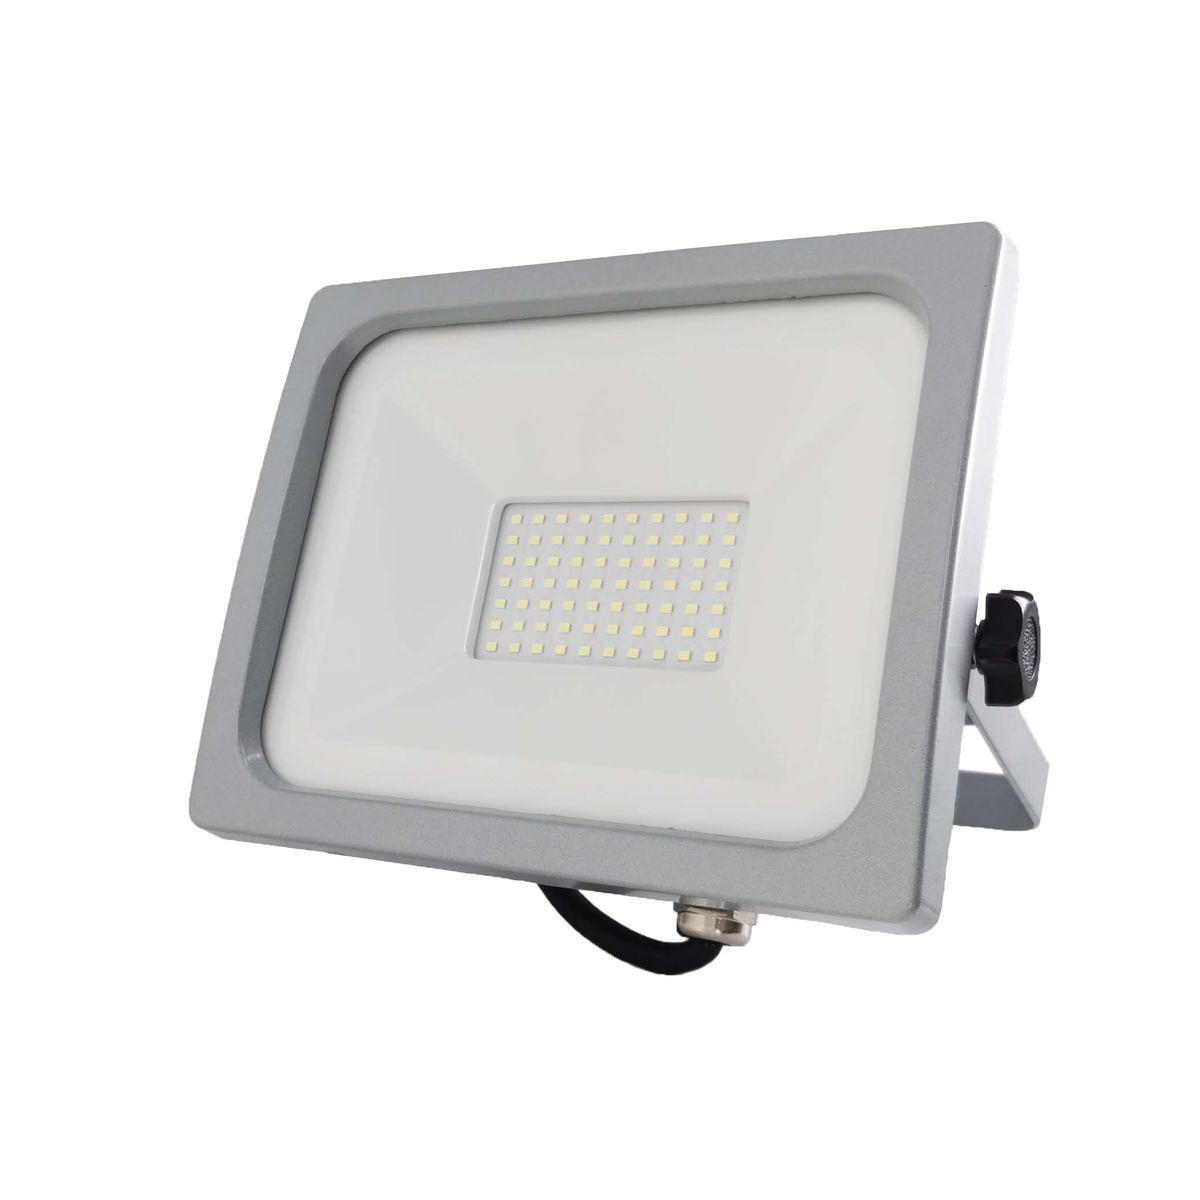 LED-Strahler Comfort 50Watt zur Wandmontage